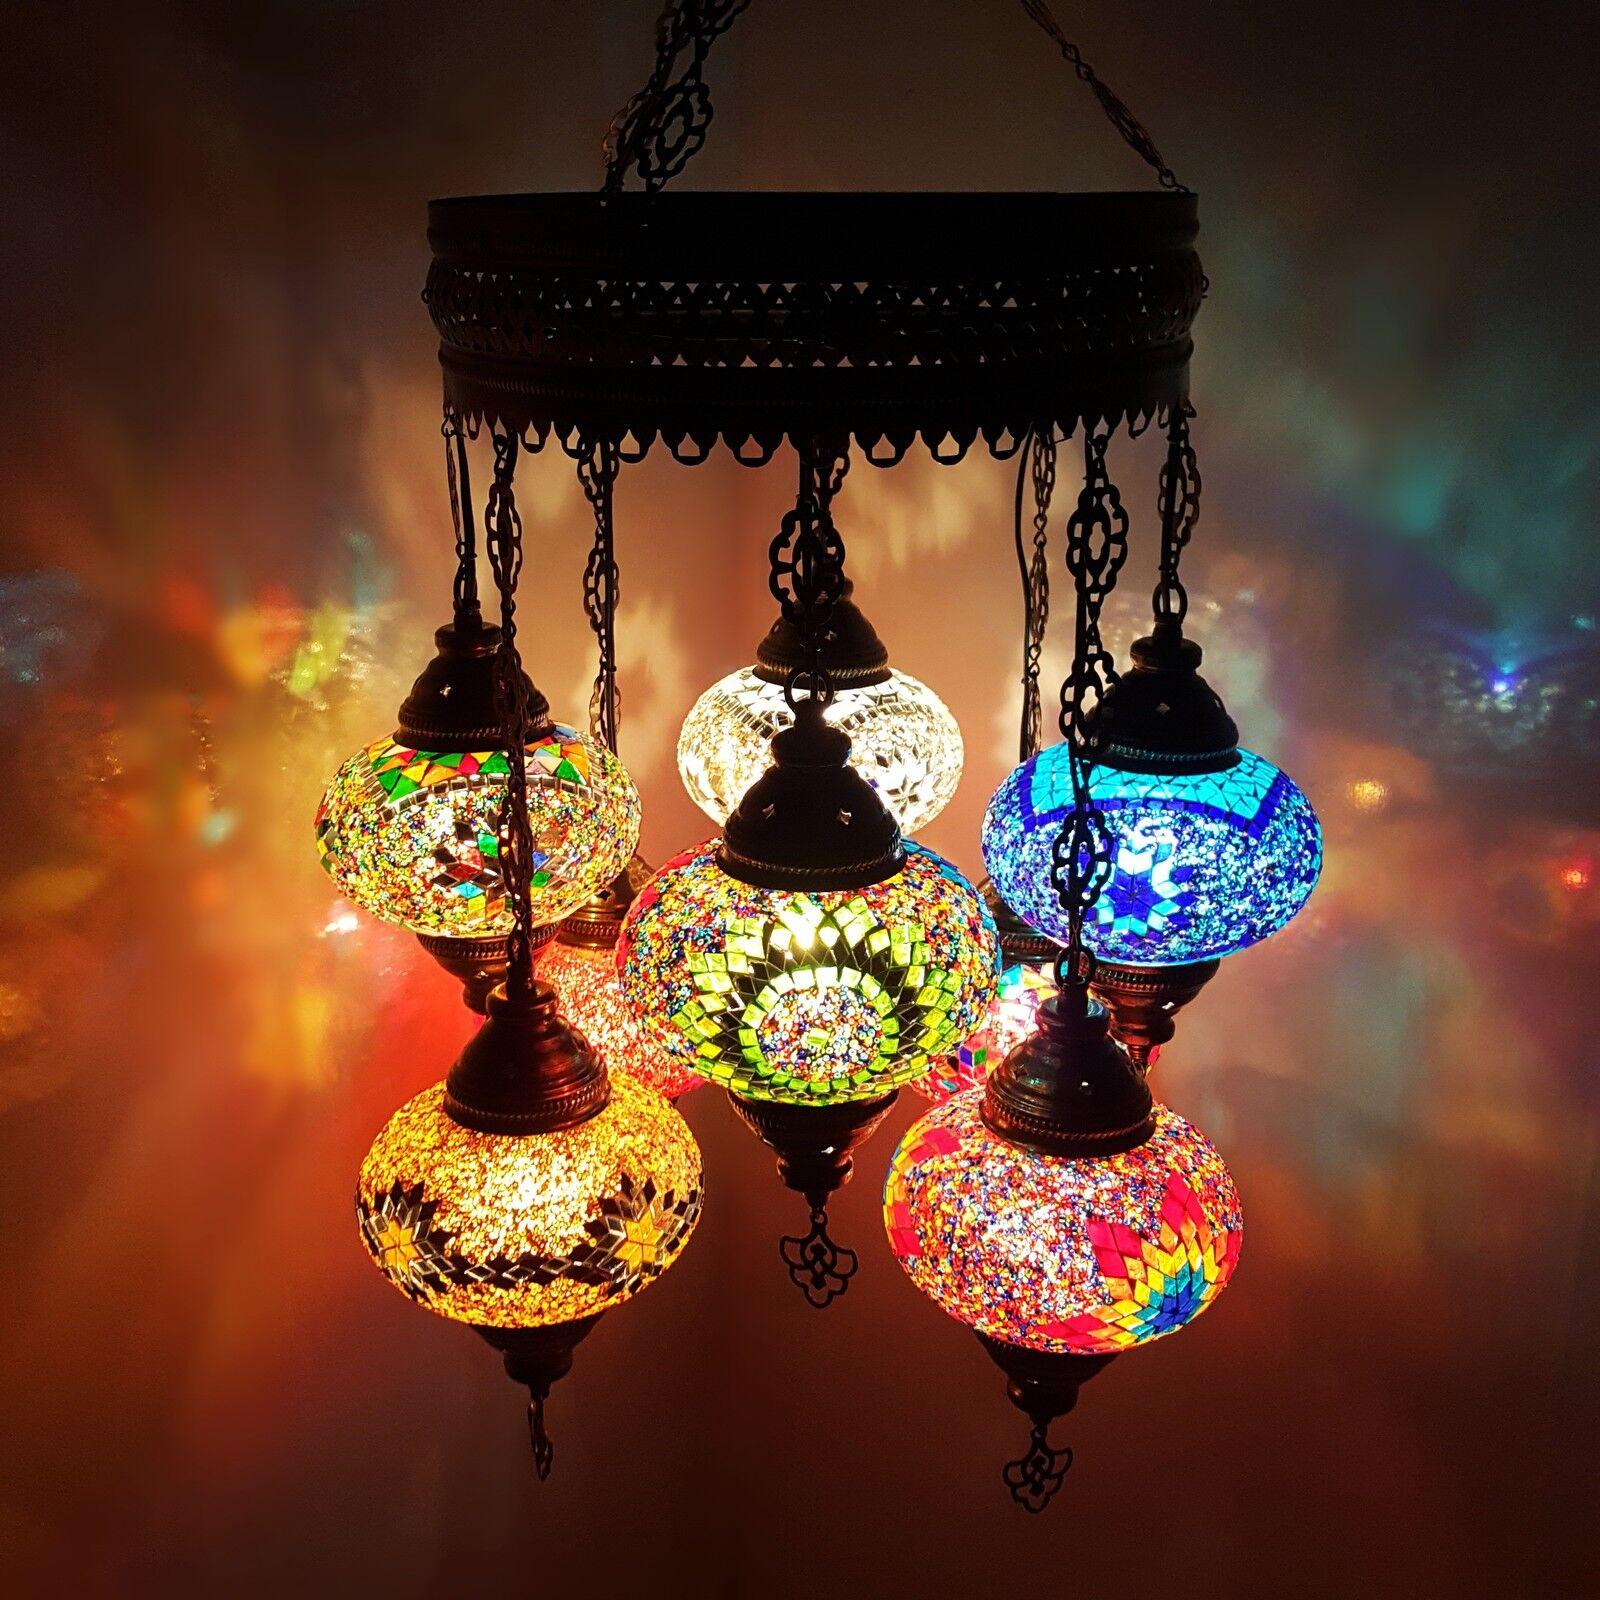 Turkish Moroccan LARGE Glass Mosaic Chandelier Lamp Light